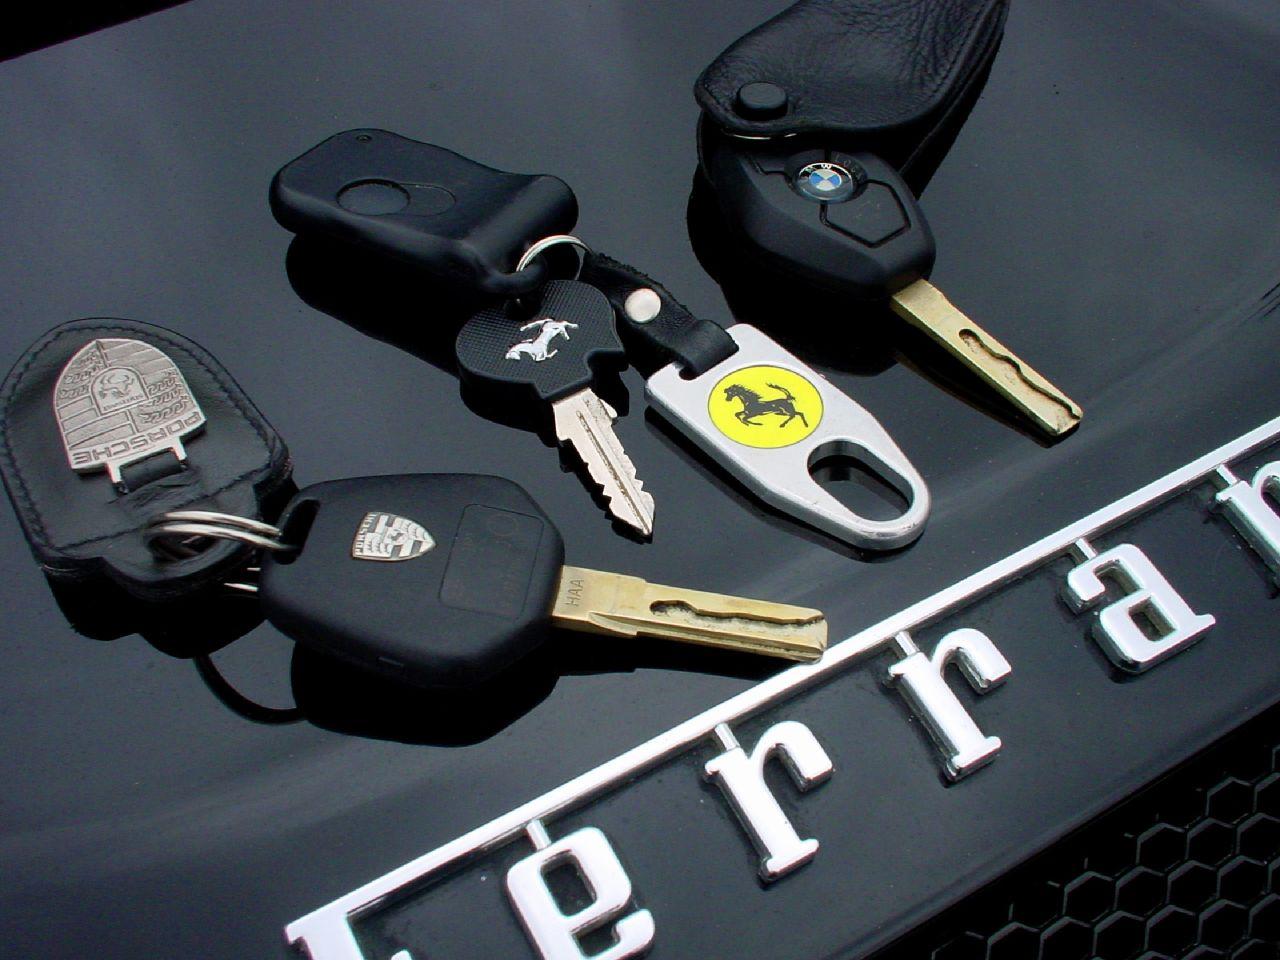 Ahli kunci mobil depok